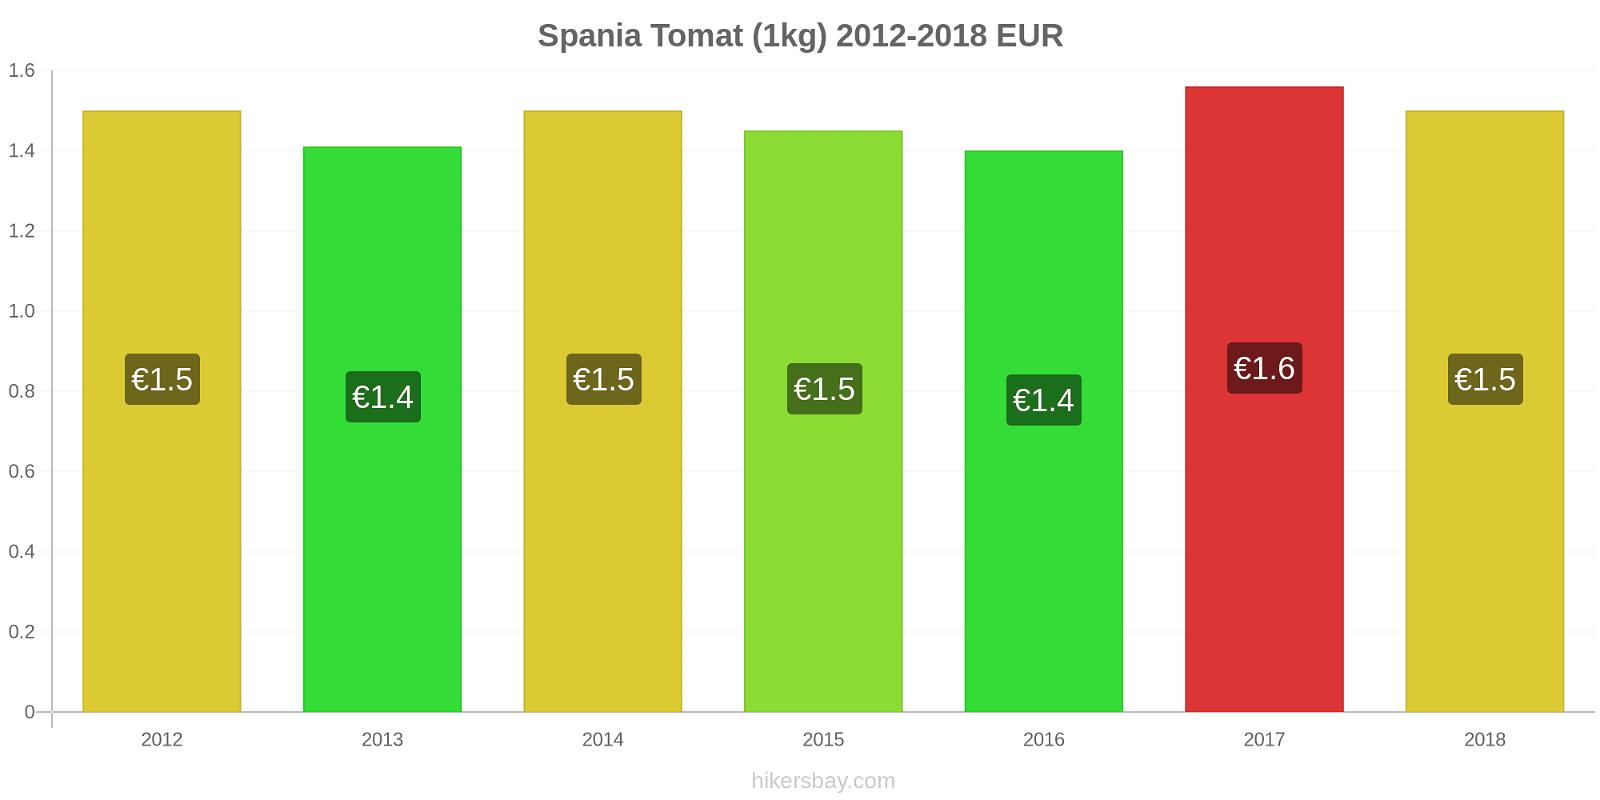 Spania prisendringer Tomat (1kg) hikersbay.com